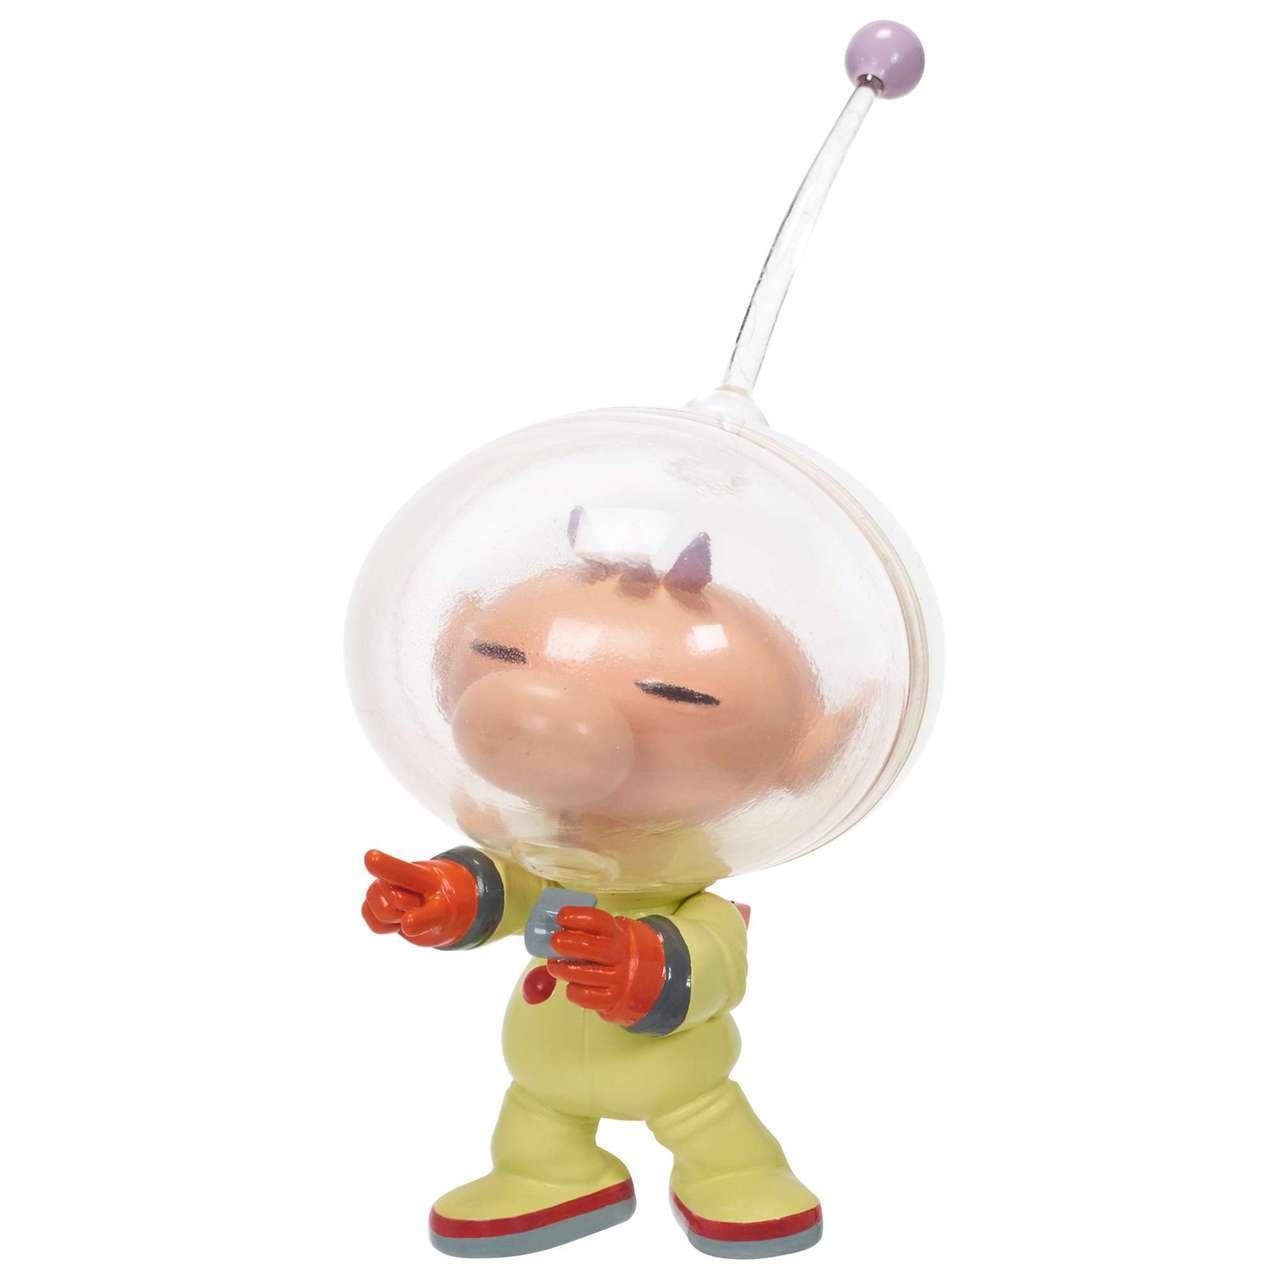 "Pikmin Captain Olimar figuurtje 6cm ""world of Nintendo"""